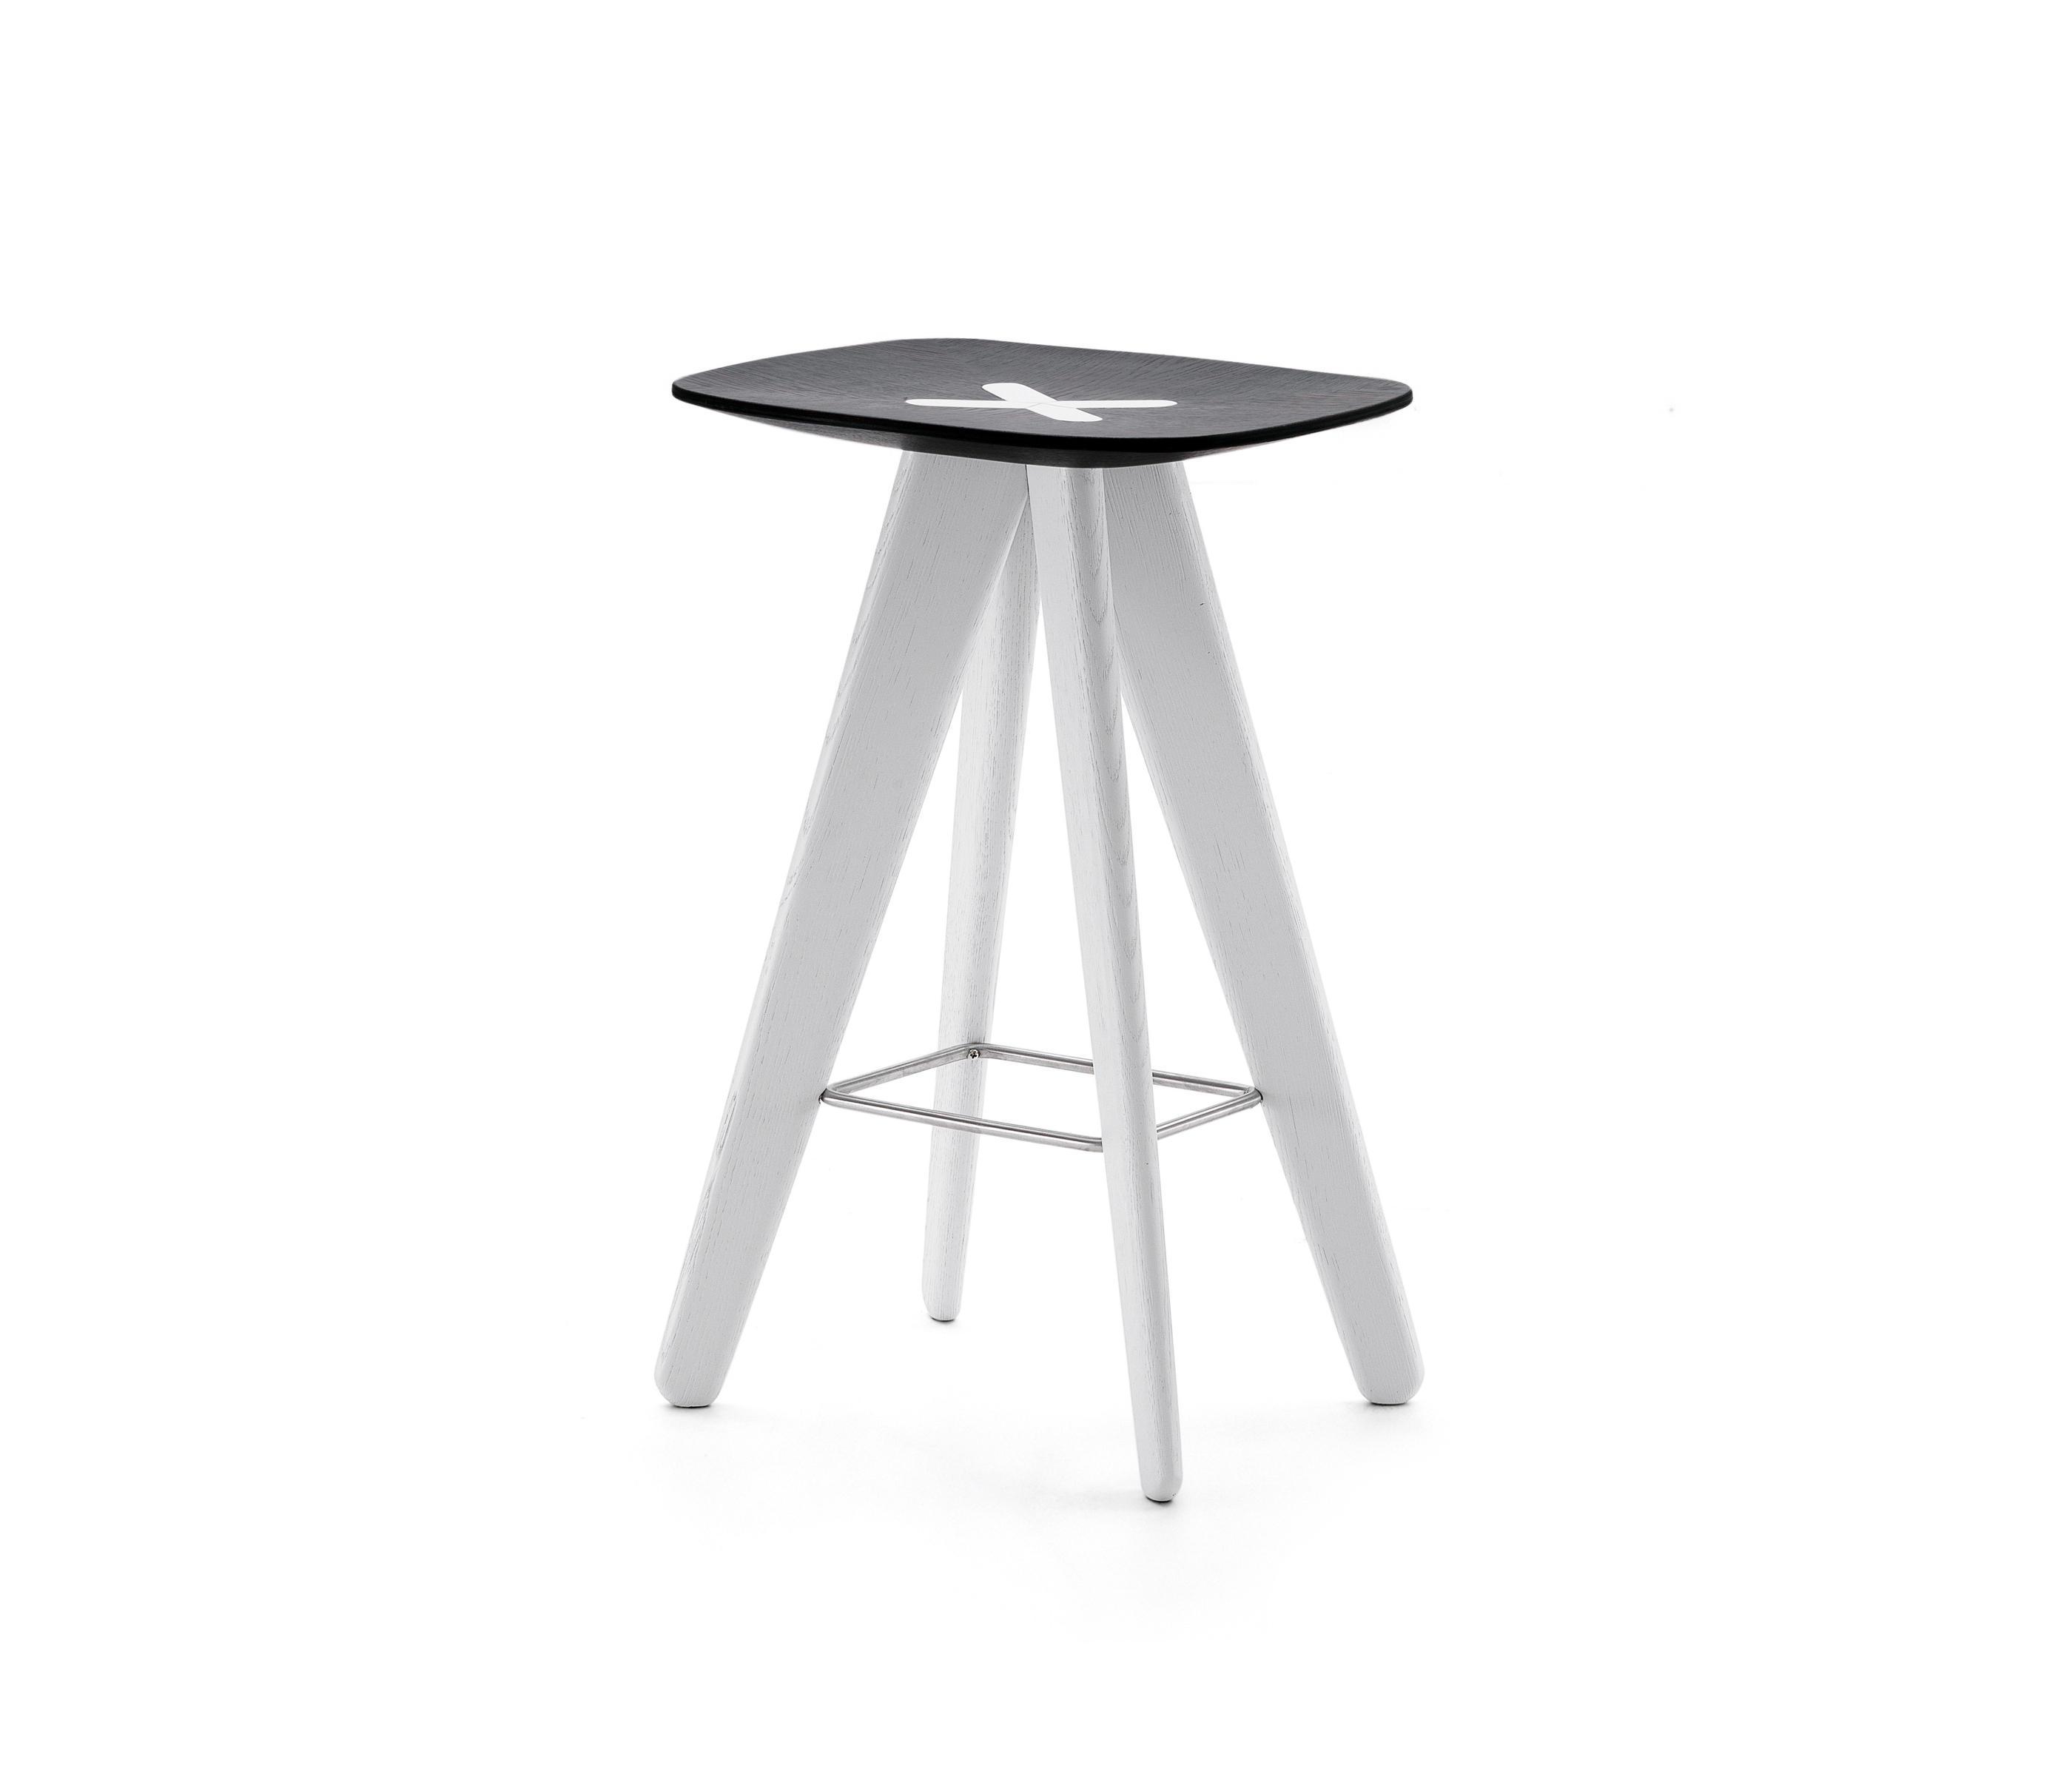 Home products chairs ics ipsilon -  Ics Stool By Poliform Bar Stools